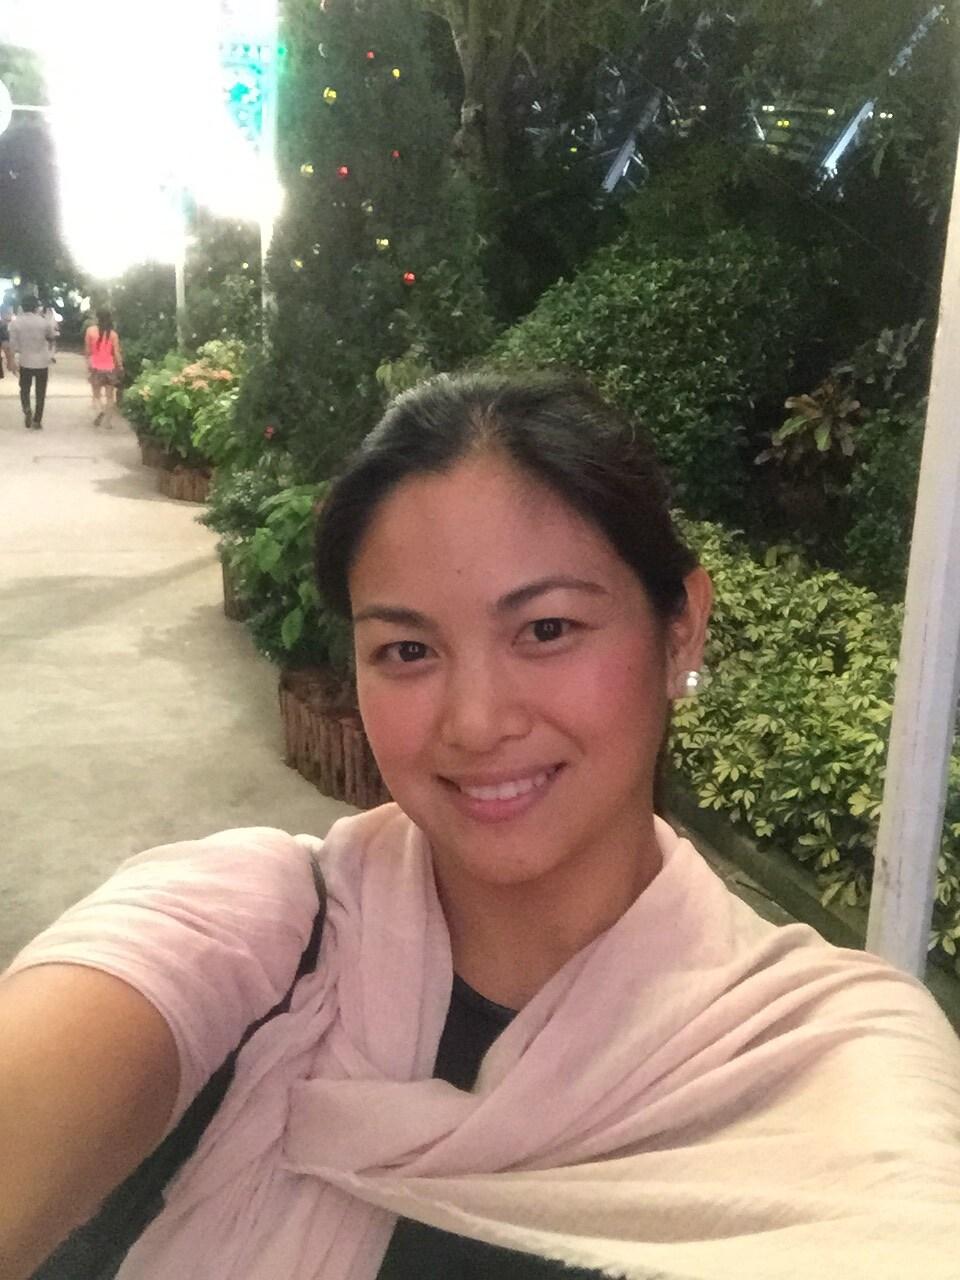 Miriam from Taguig City